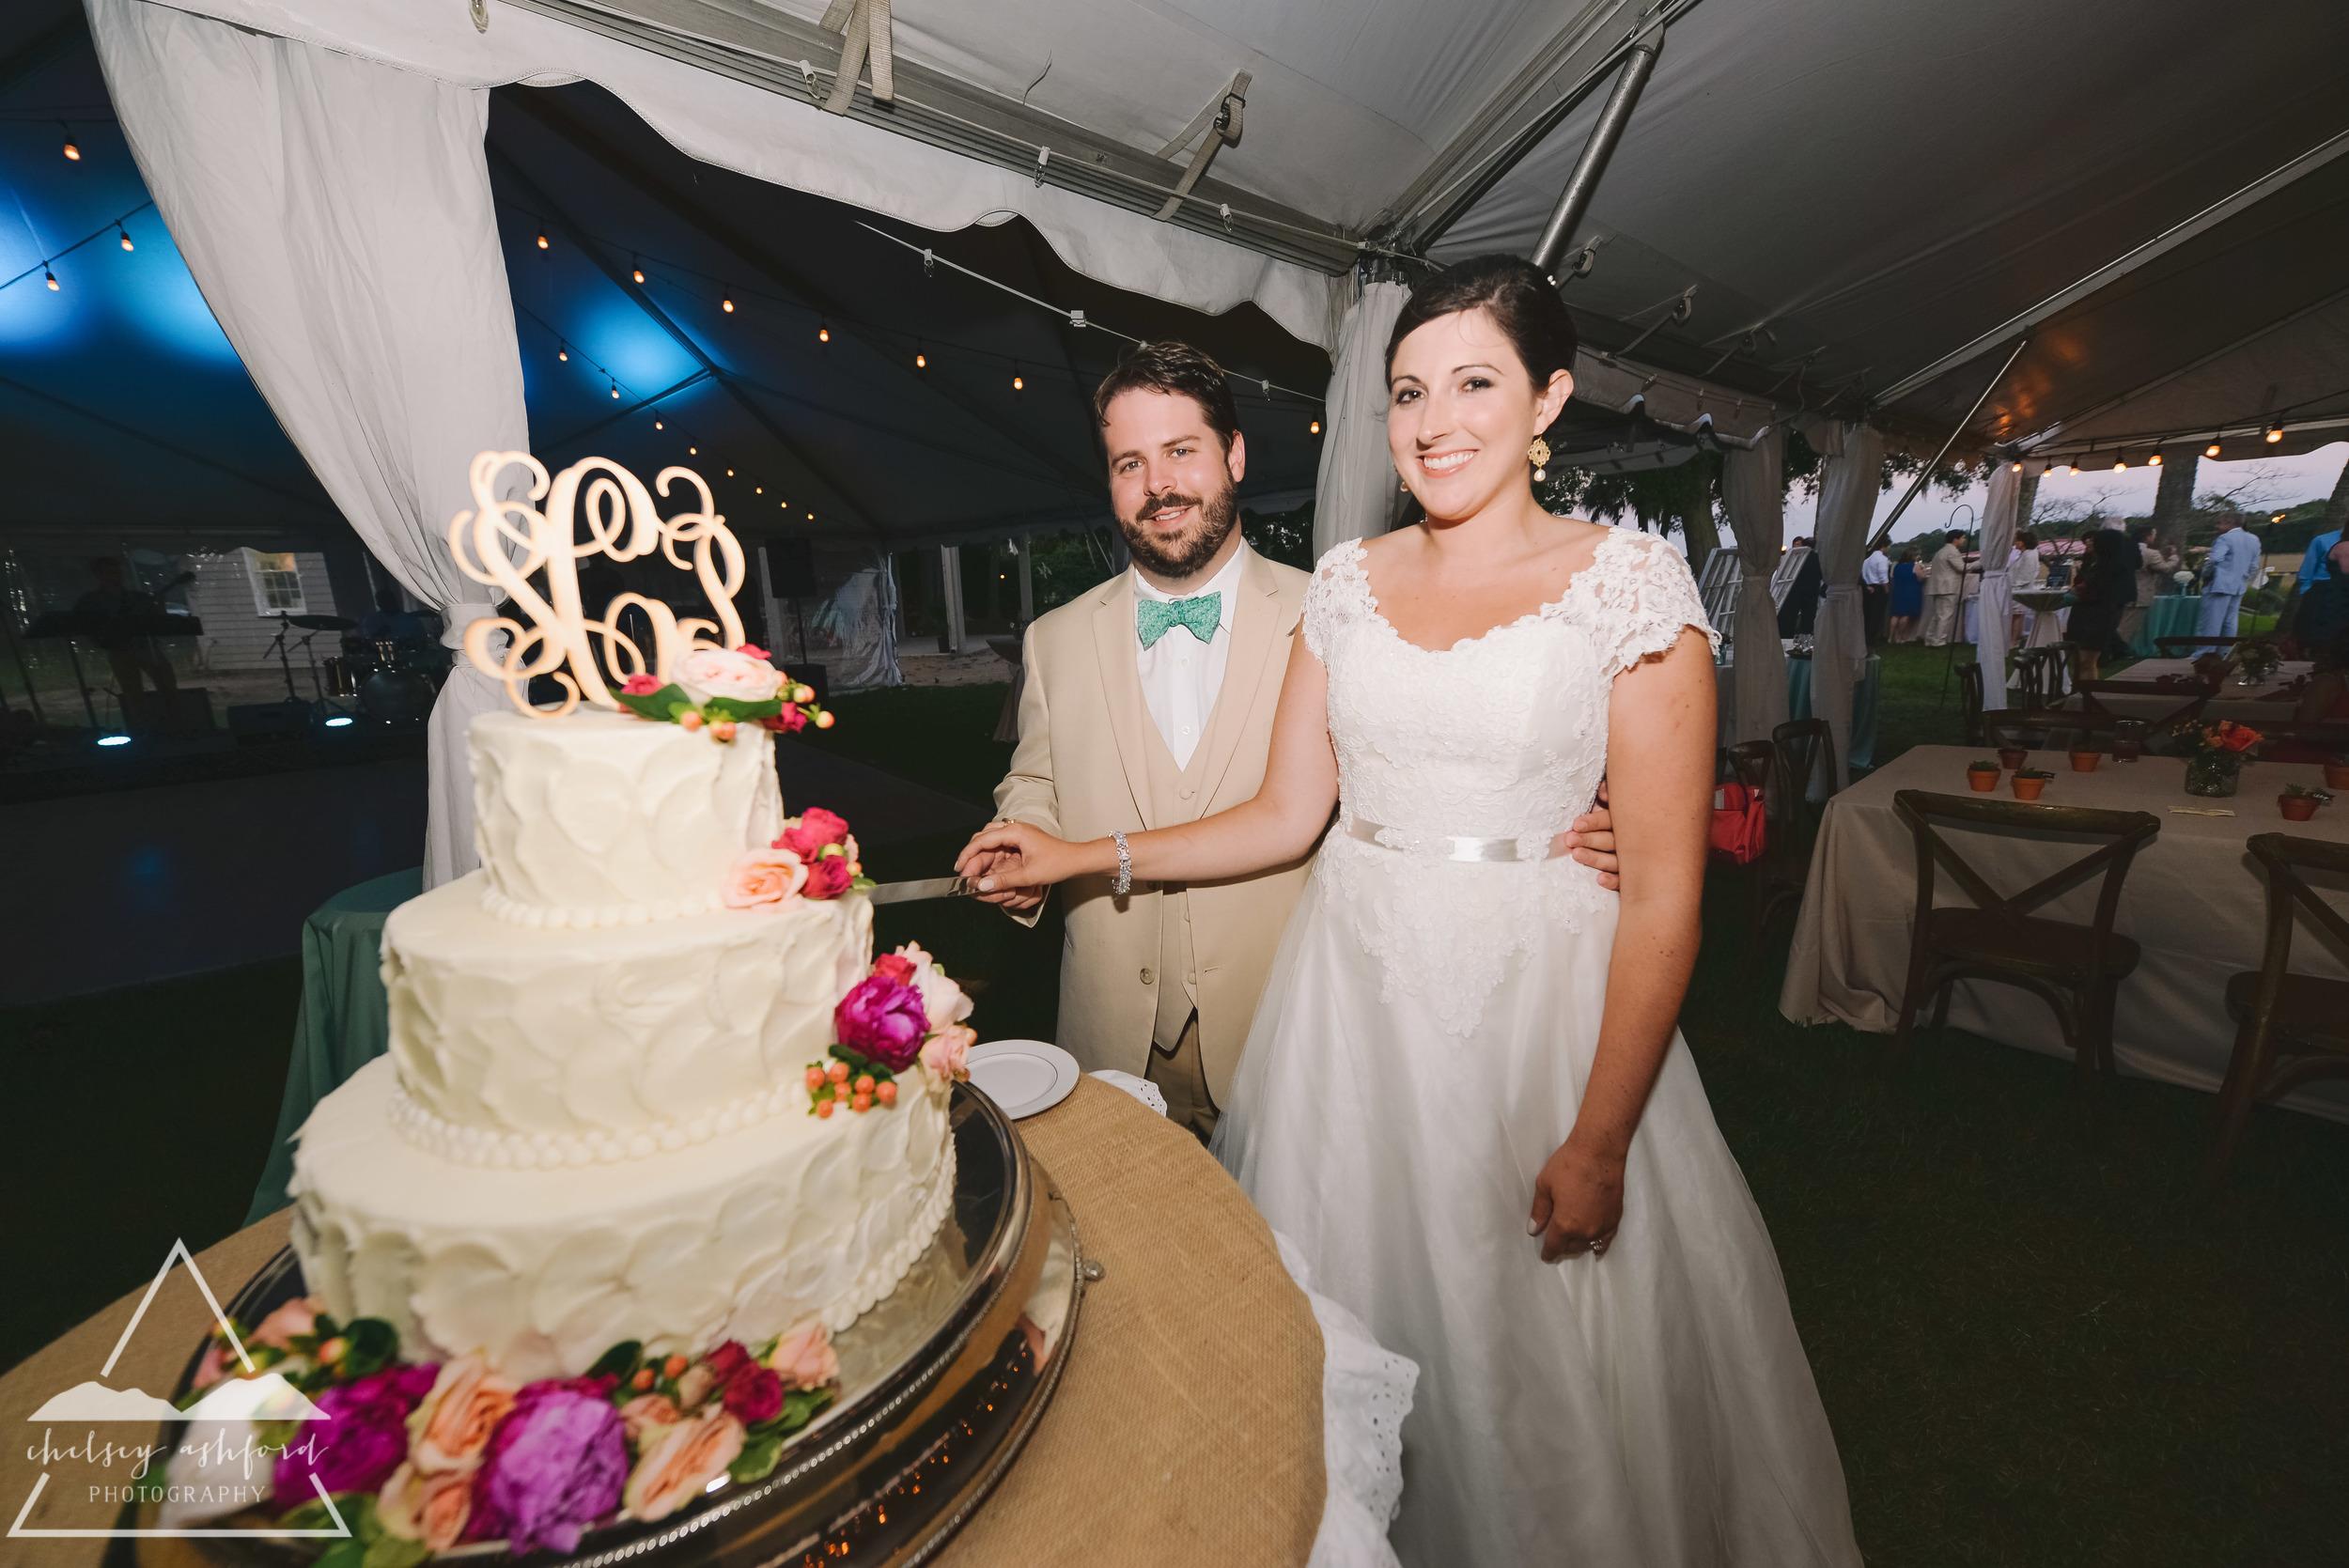 Clarkson_wedding_web-156.jpg